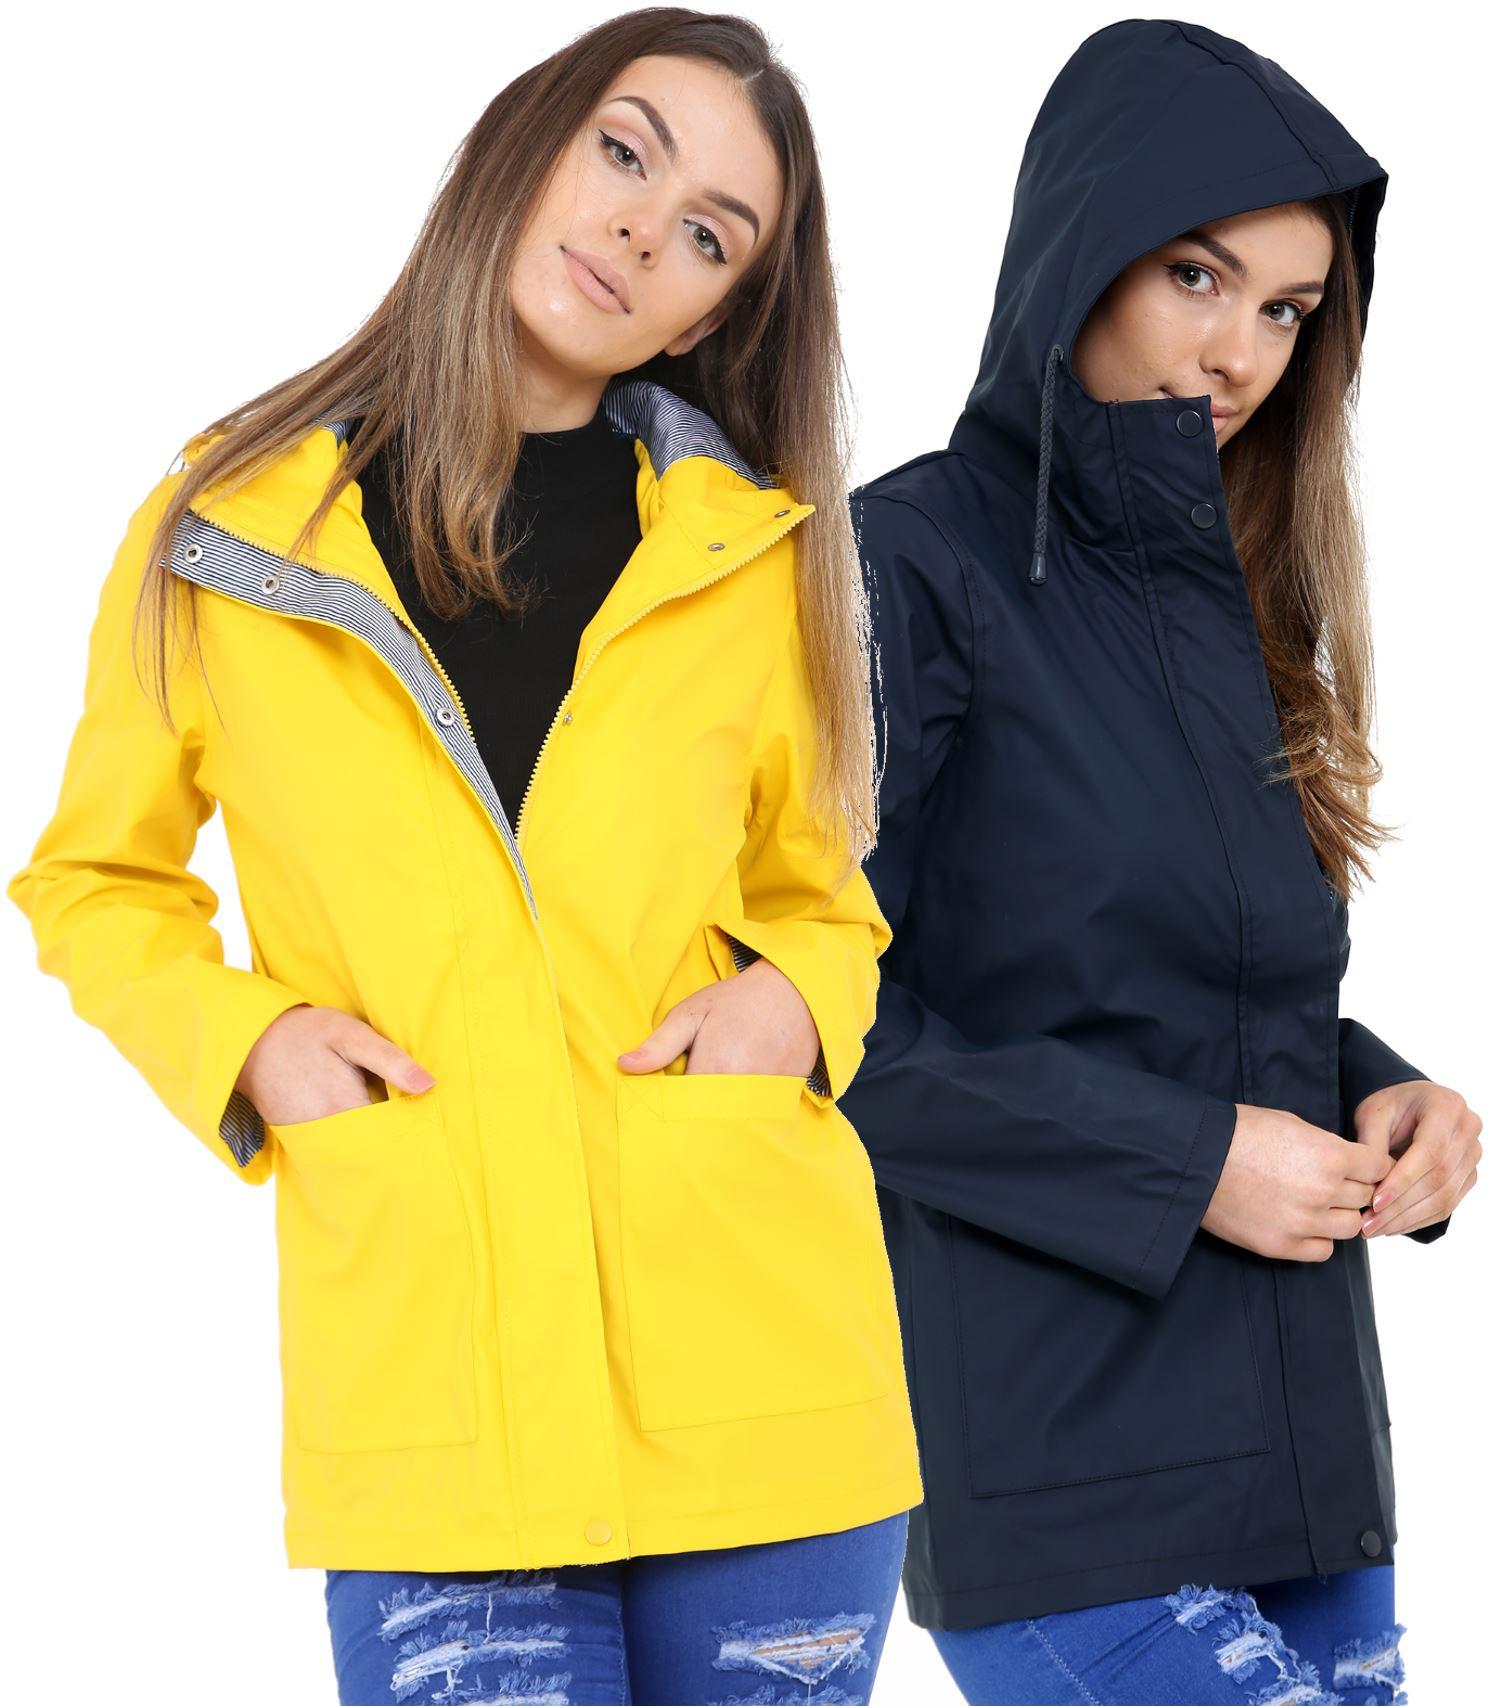 New-Womens-Lightweight-Rain-Trench-Coat-Jacket-Parka-Daily-Rain-Mac